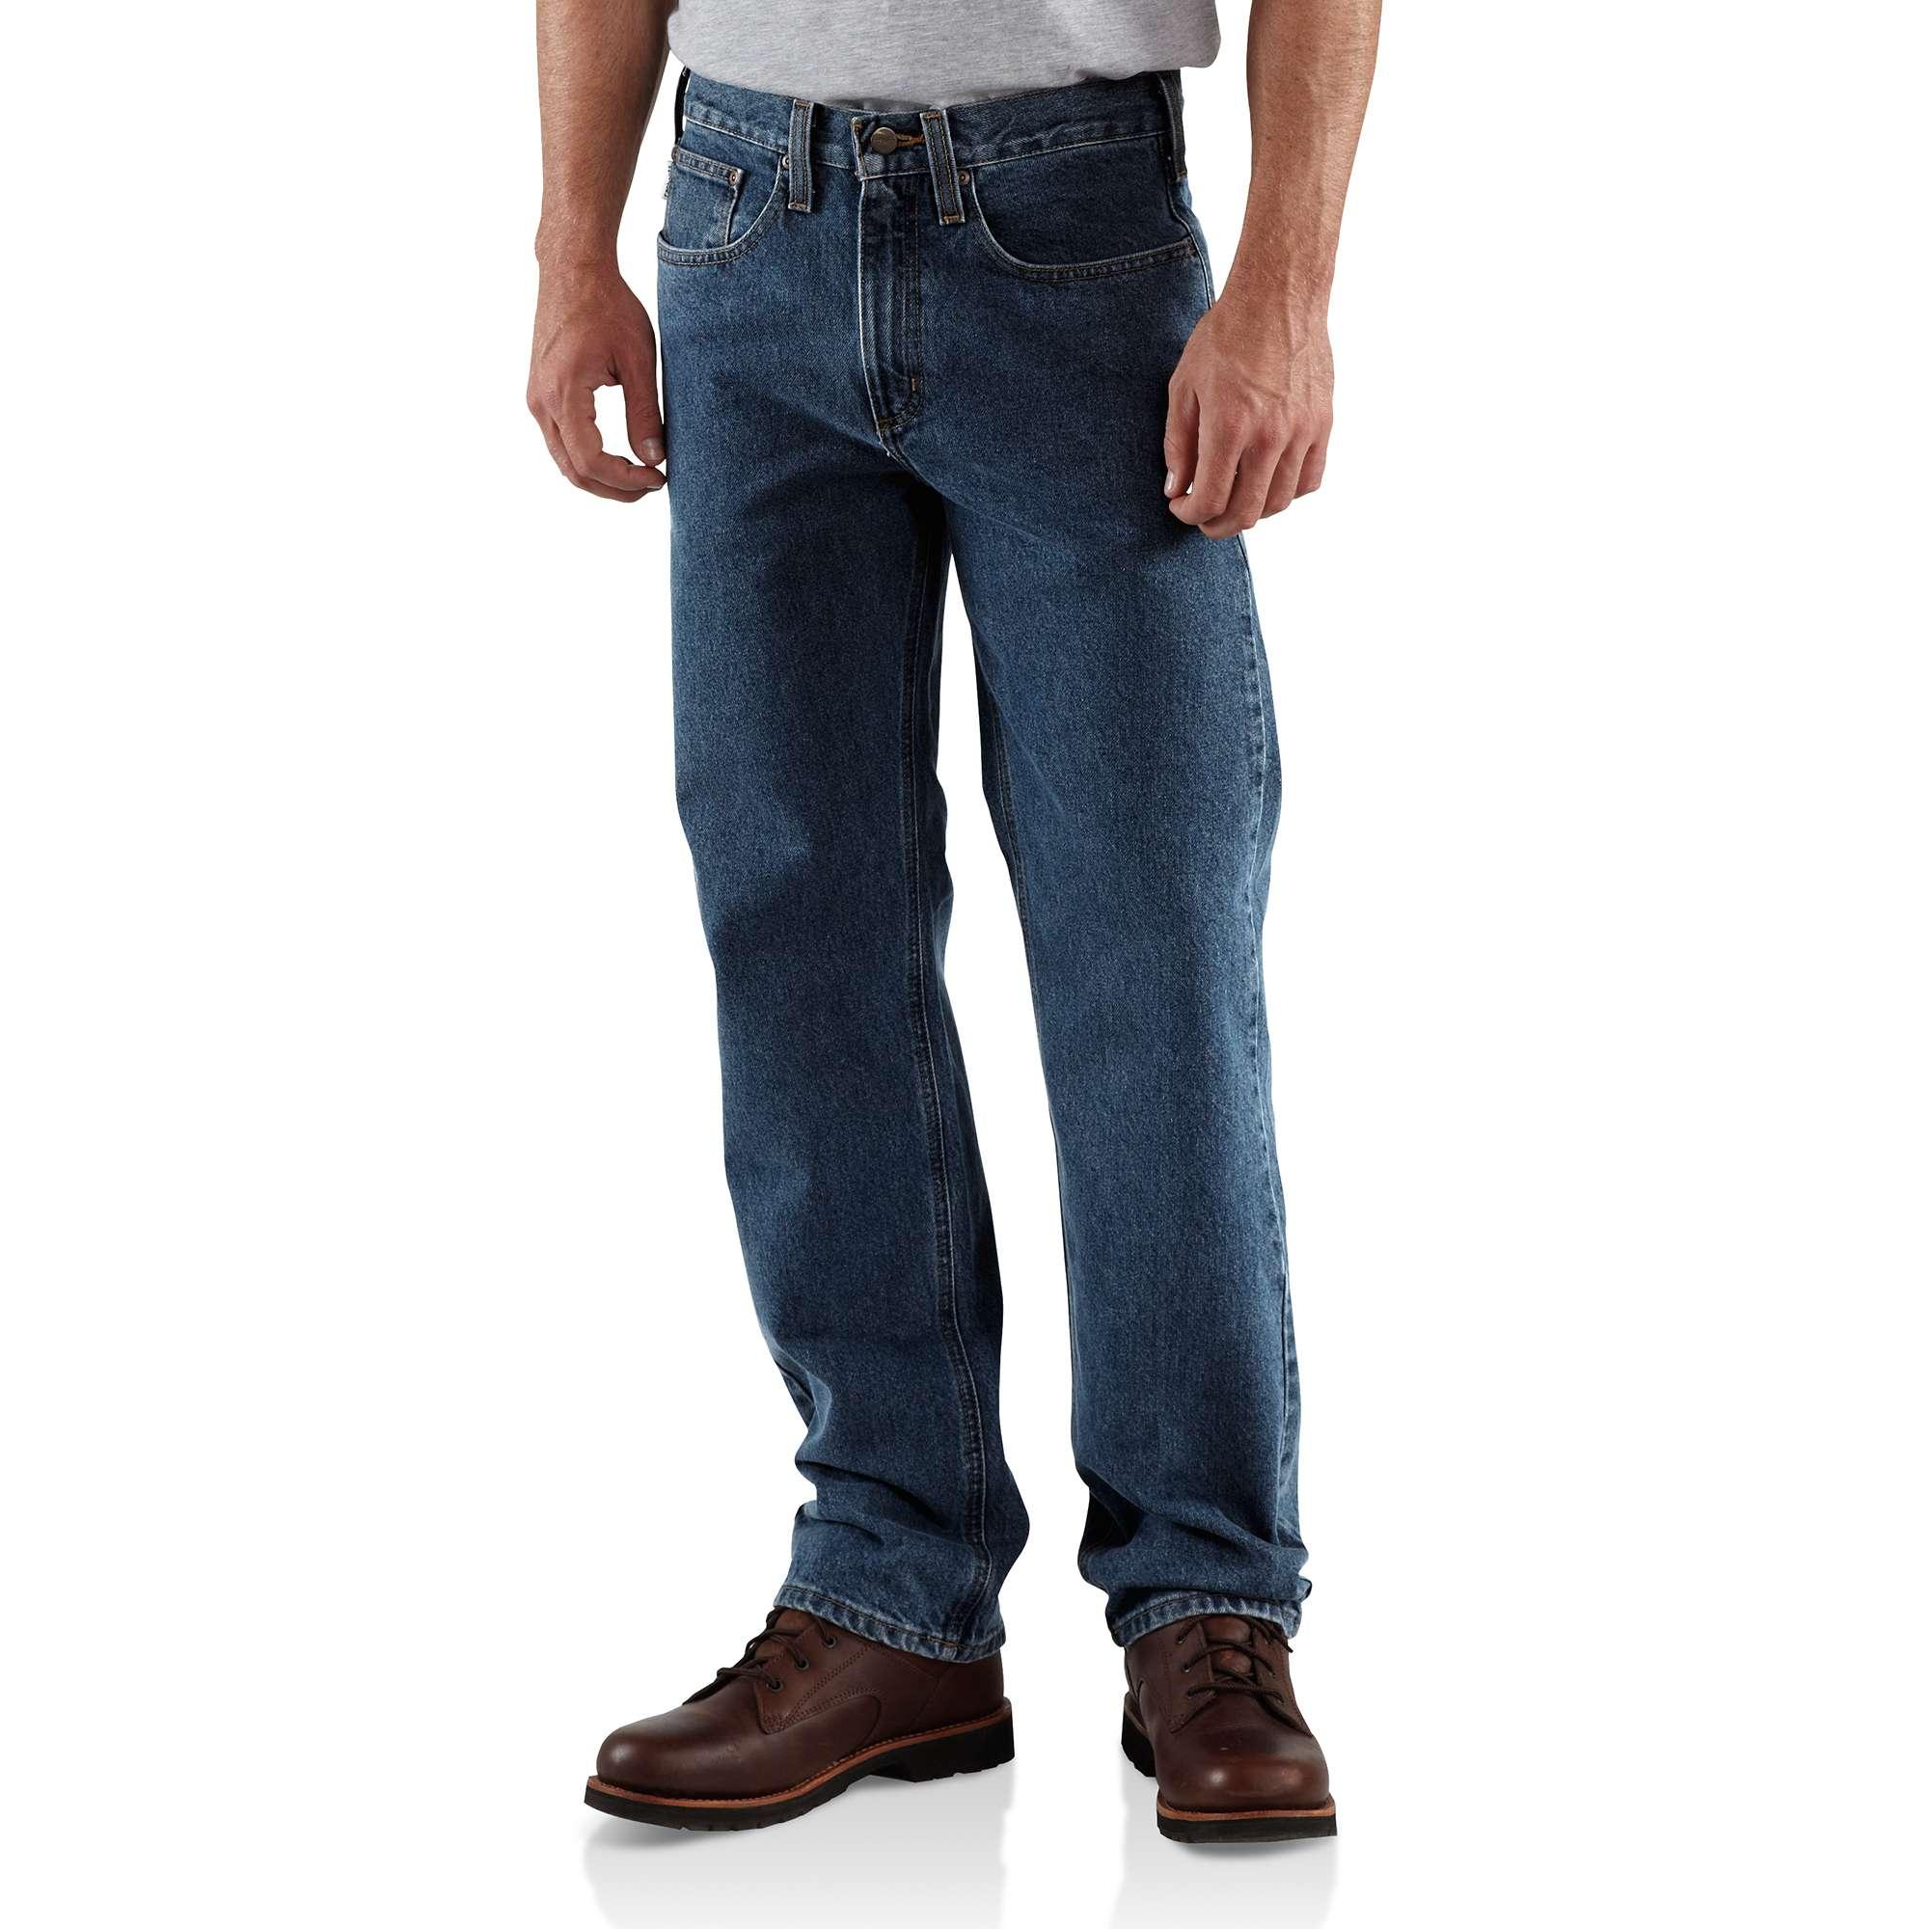 Carhartt Straight/Traditional-Fit Straight-Leg Jean